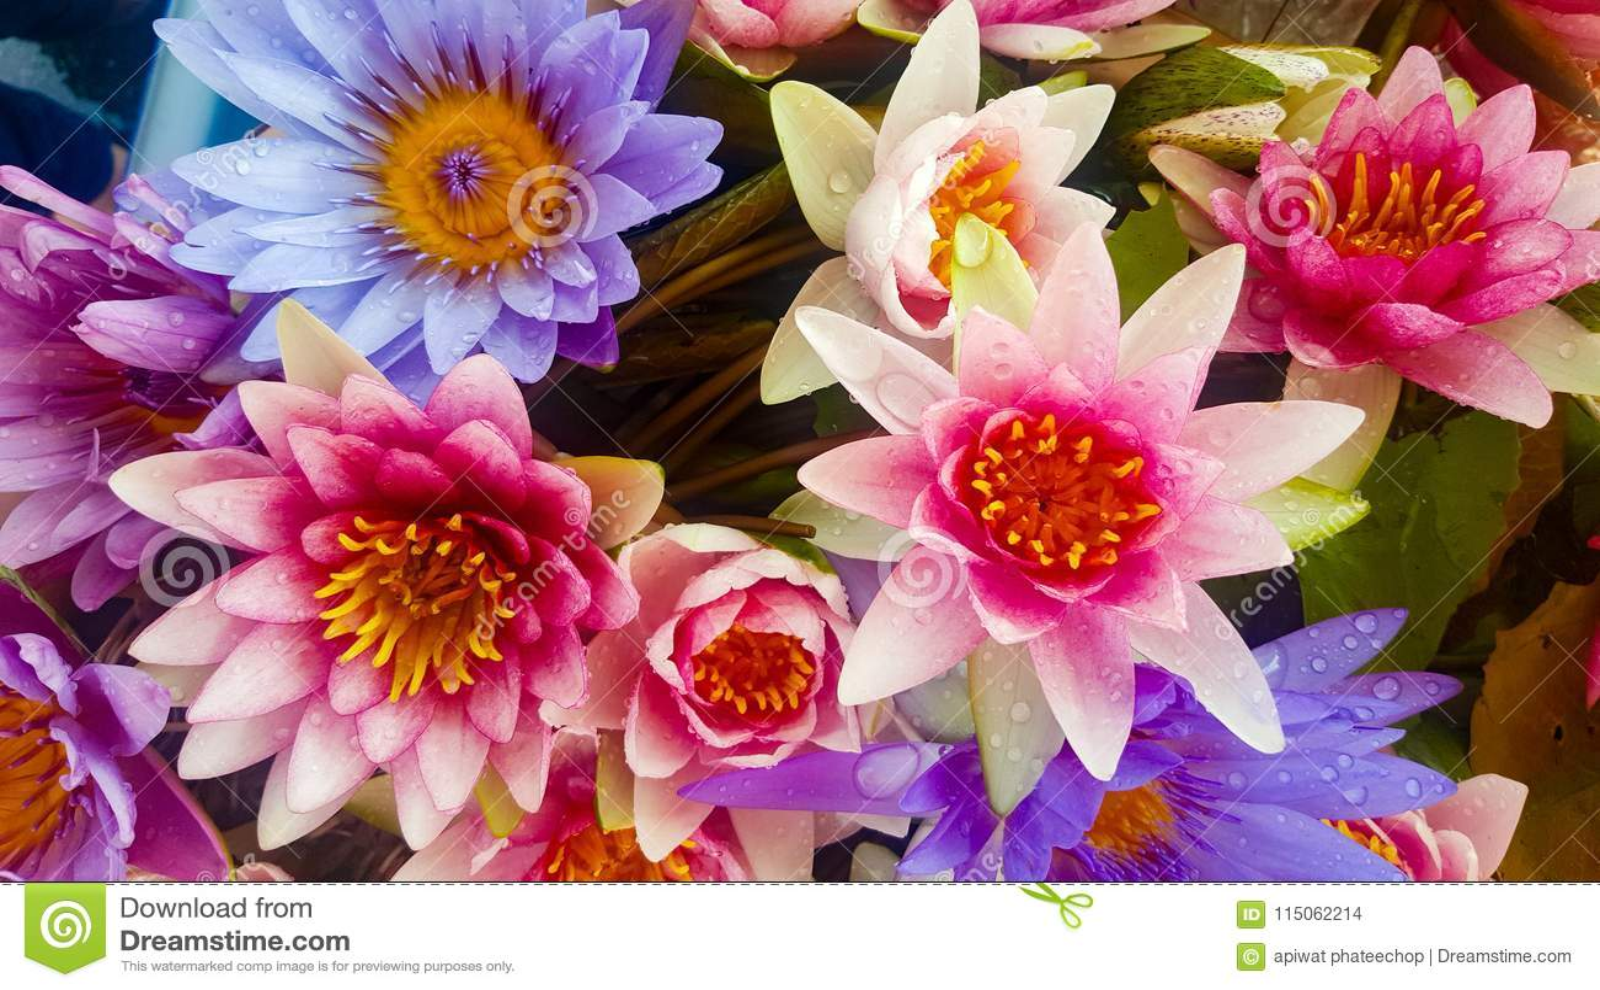 Lotus Background Stock Photo Image Of Blossom Screensaver 115062214